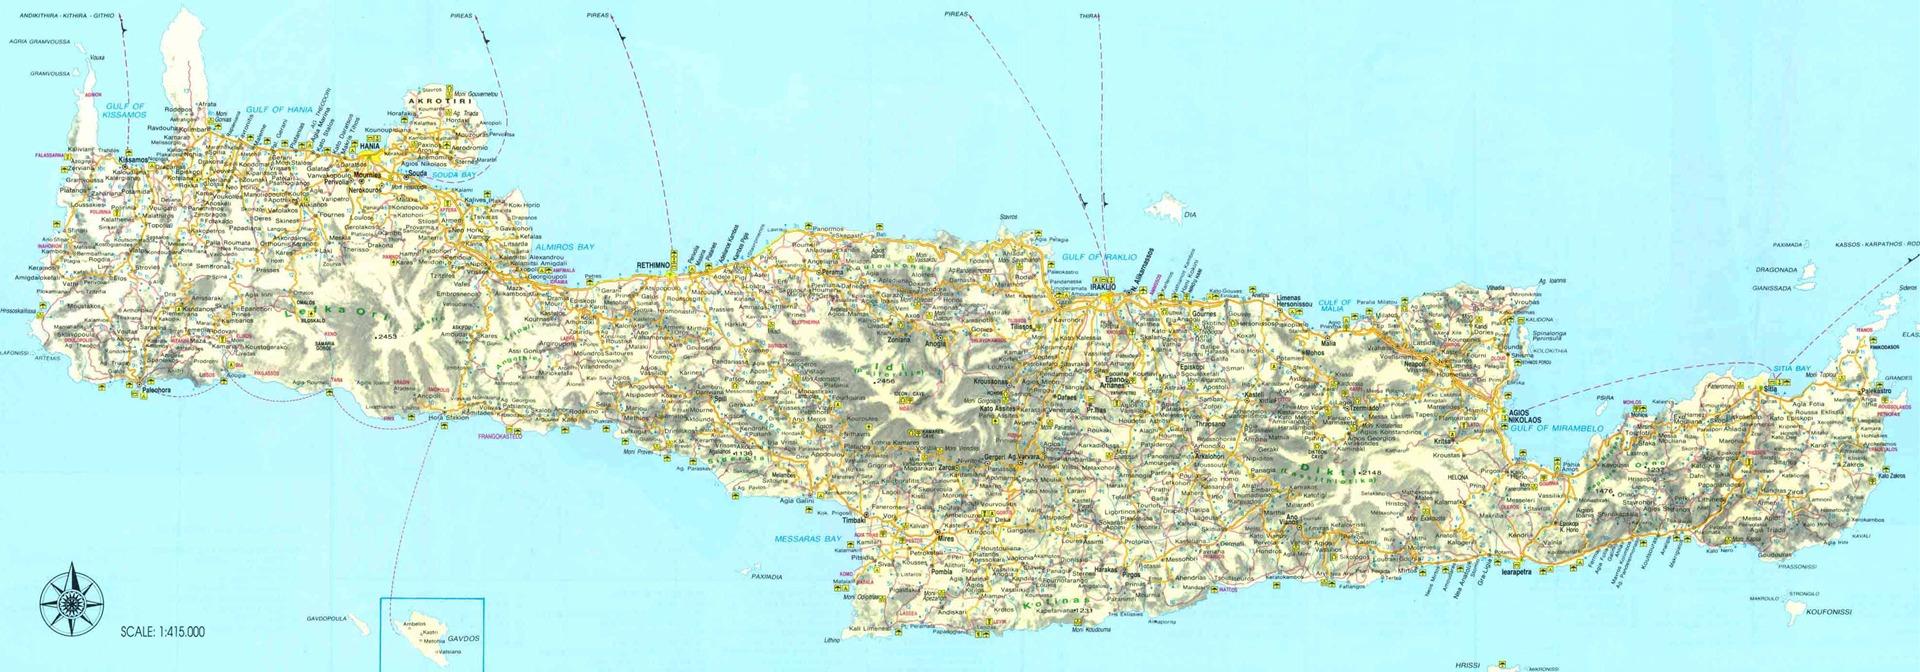 карта пляжей крита с фото может